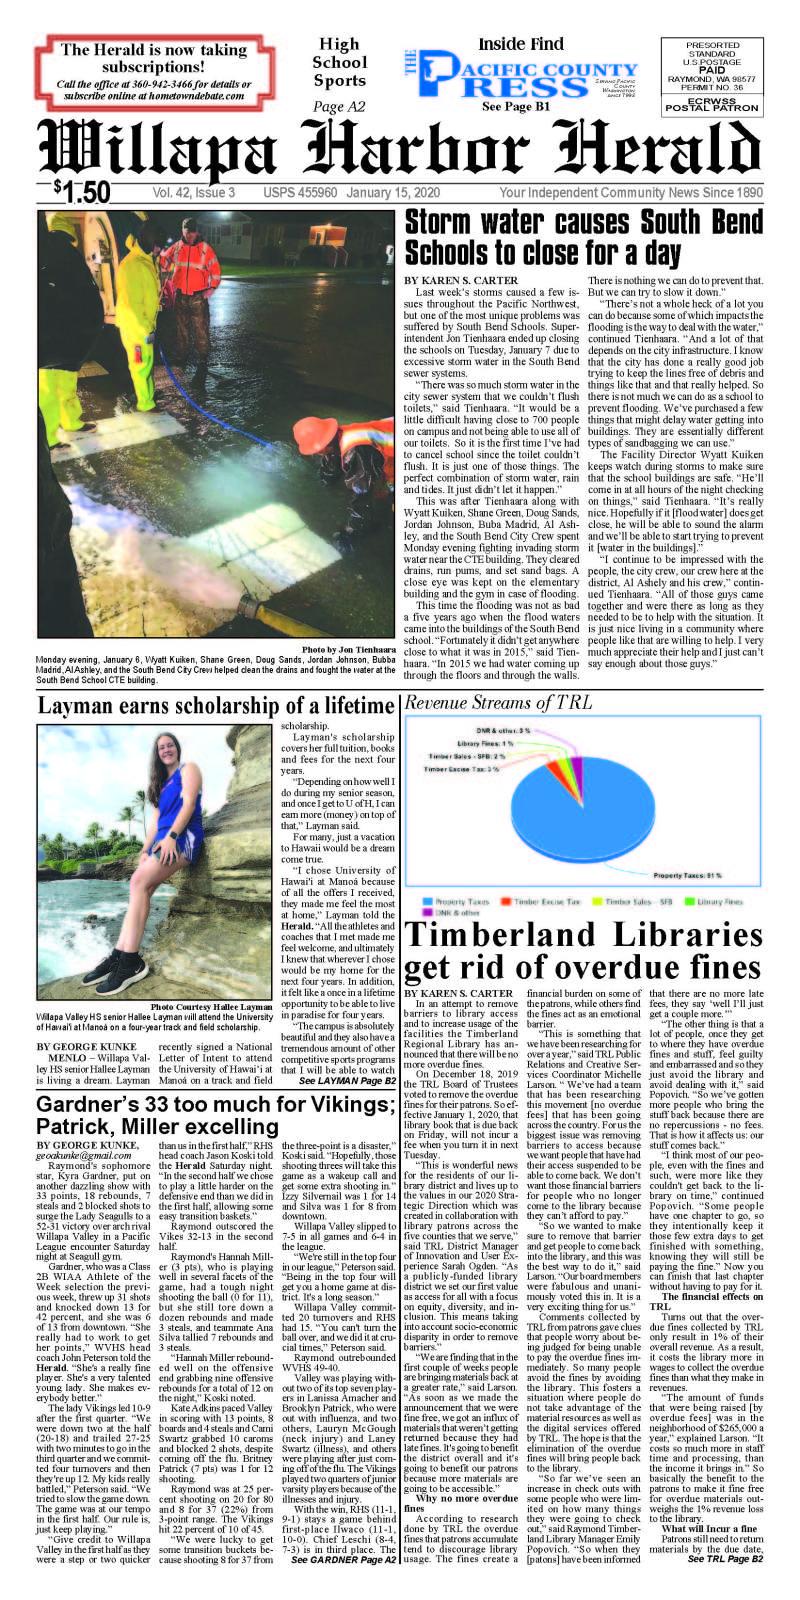 January 15, 2020 Willapa Harbor Herald and Pacific County Press